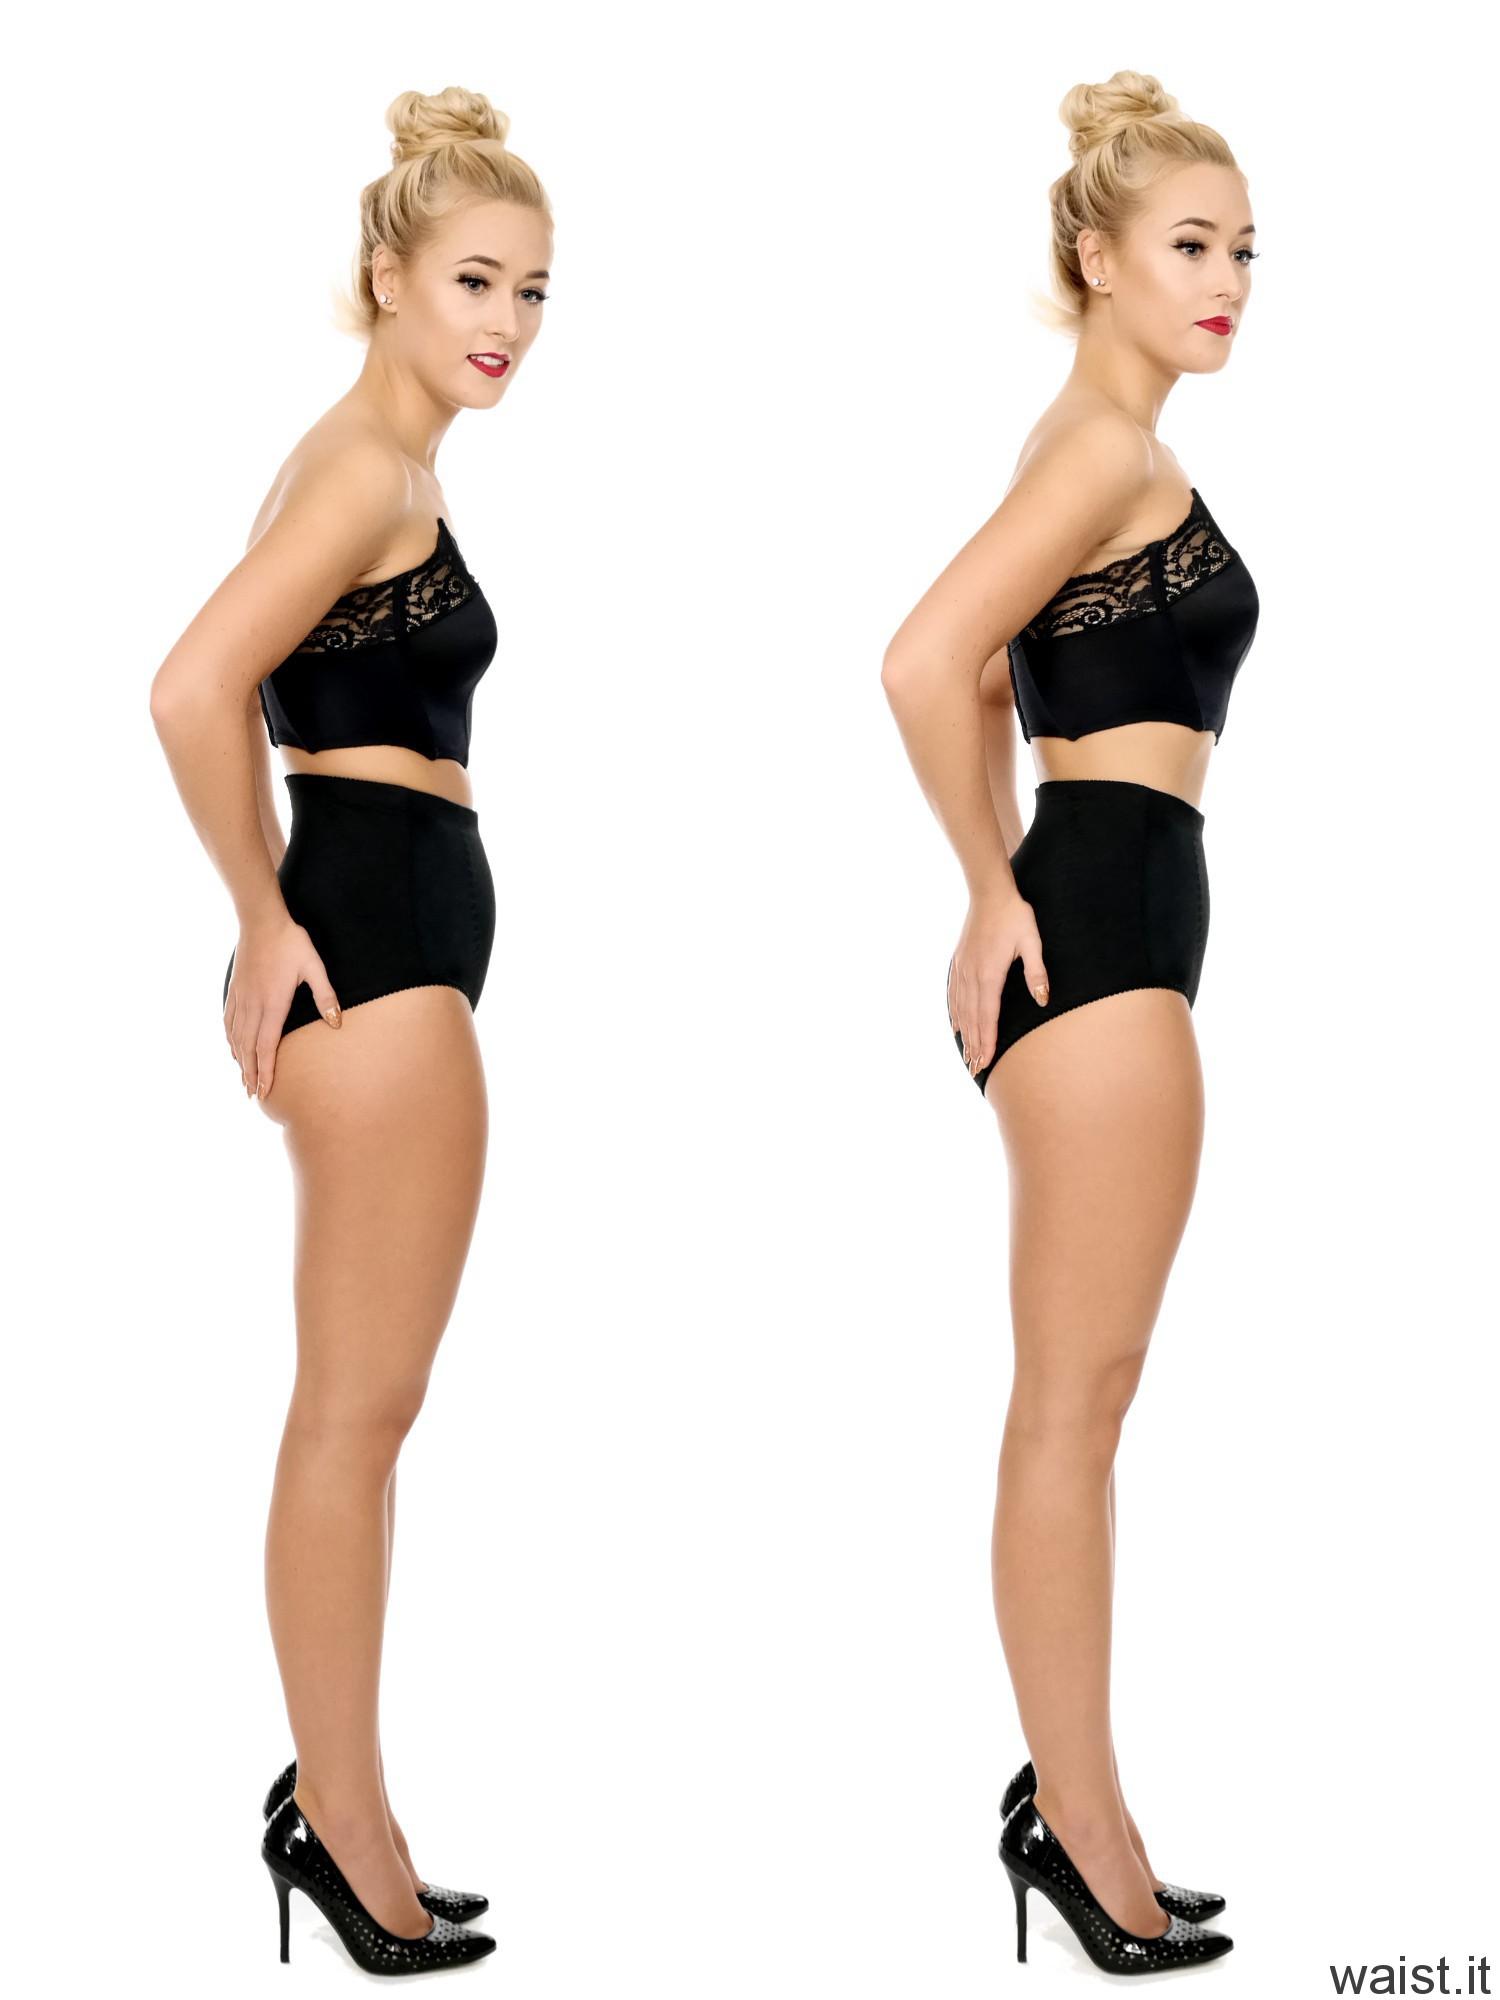 2016-11-06 Fleur fitness collage - posture